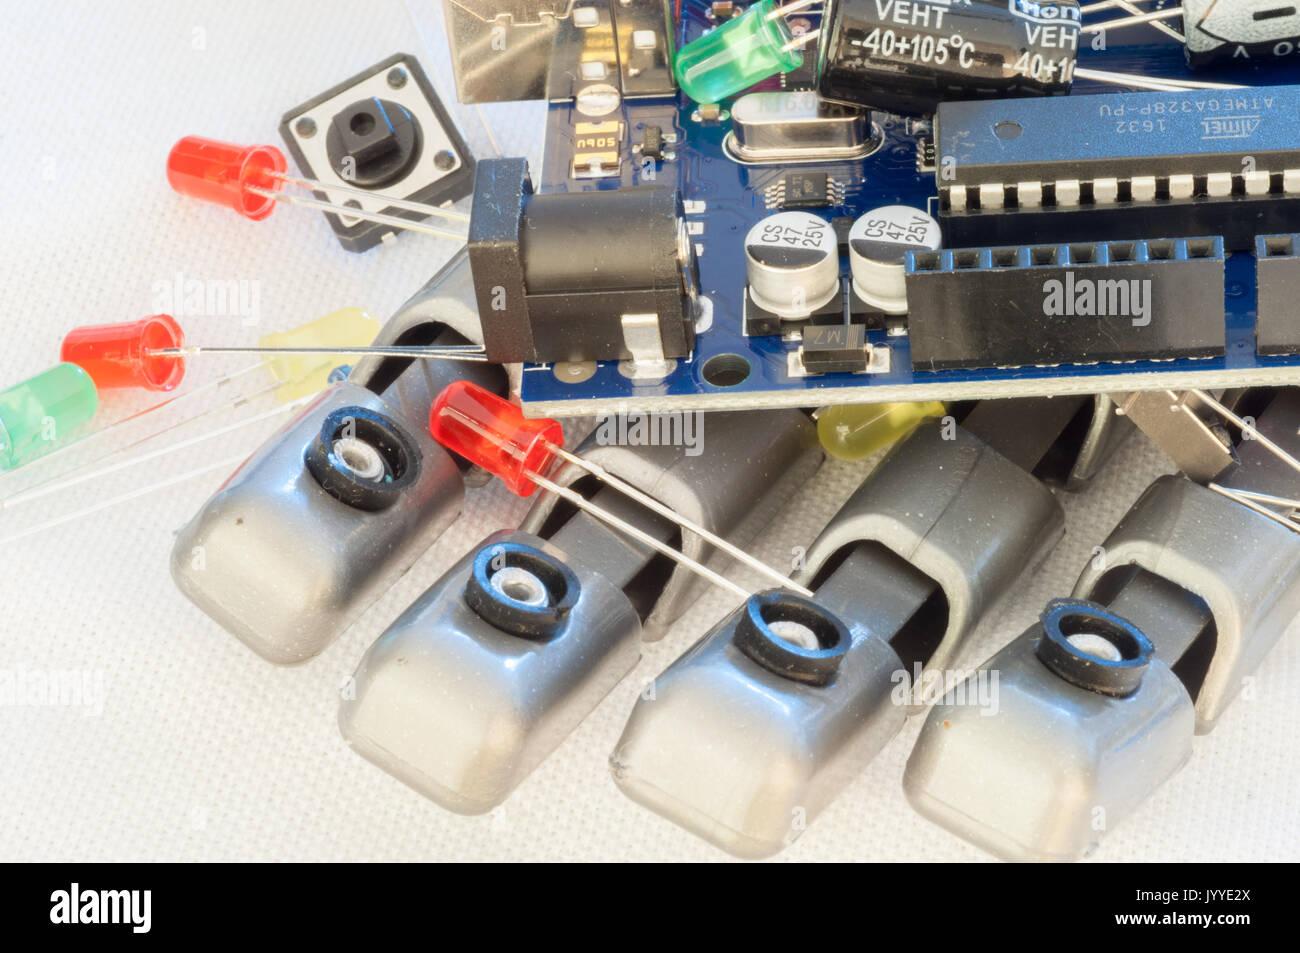 Beautiful Raw Macro Robotics Background Stock Photo 154882418 Alamy